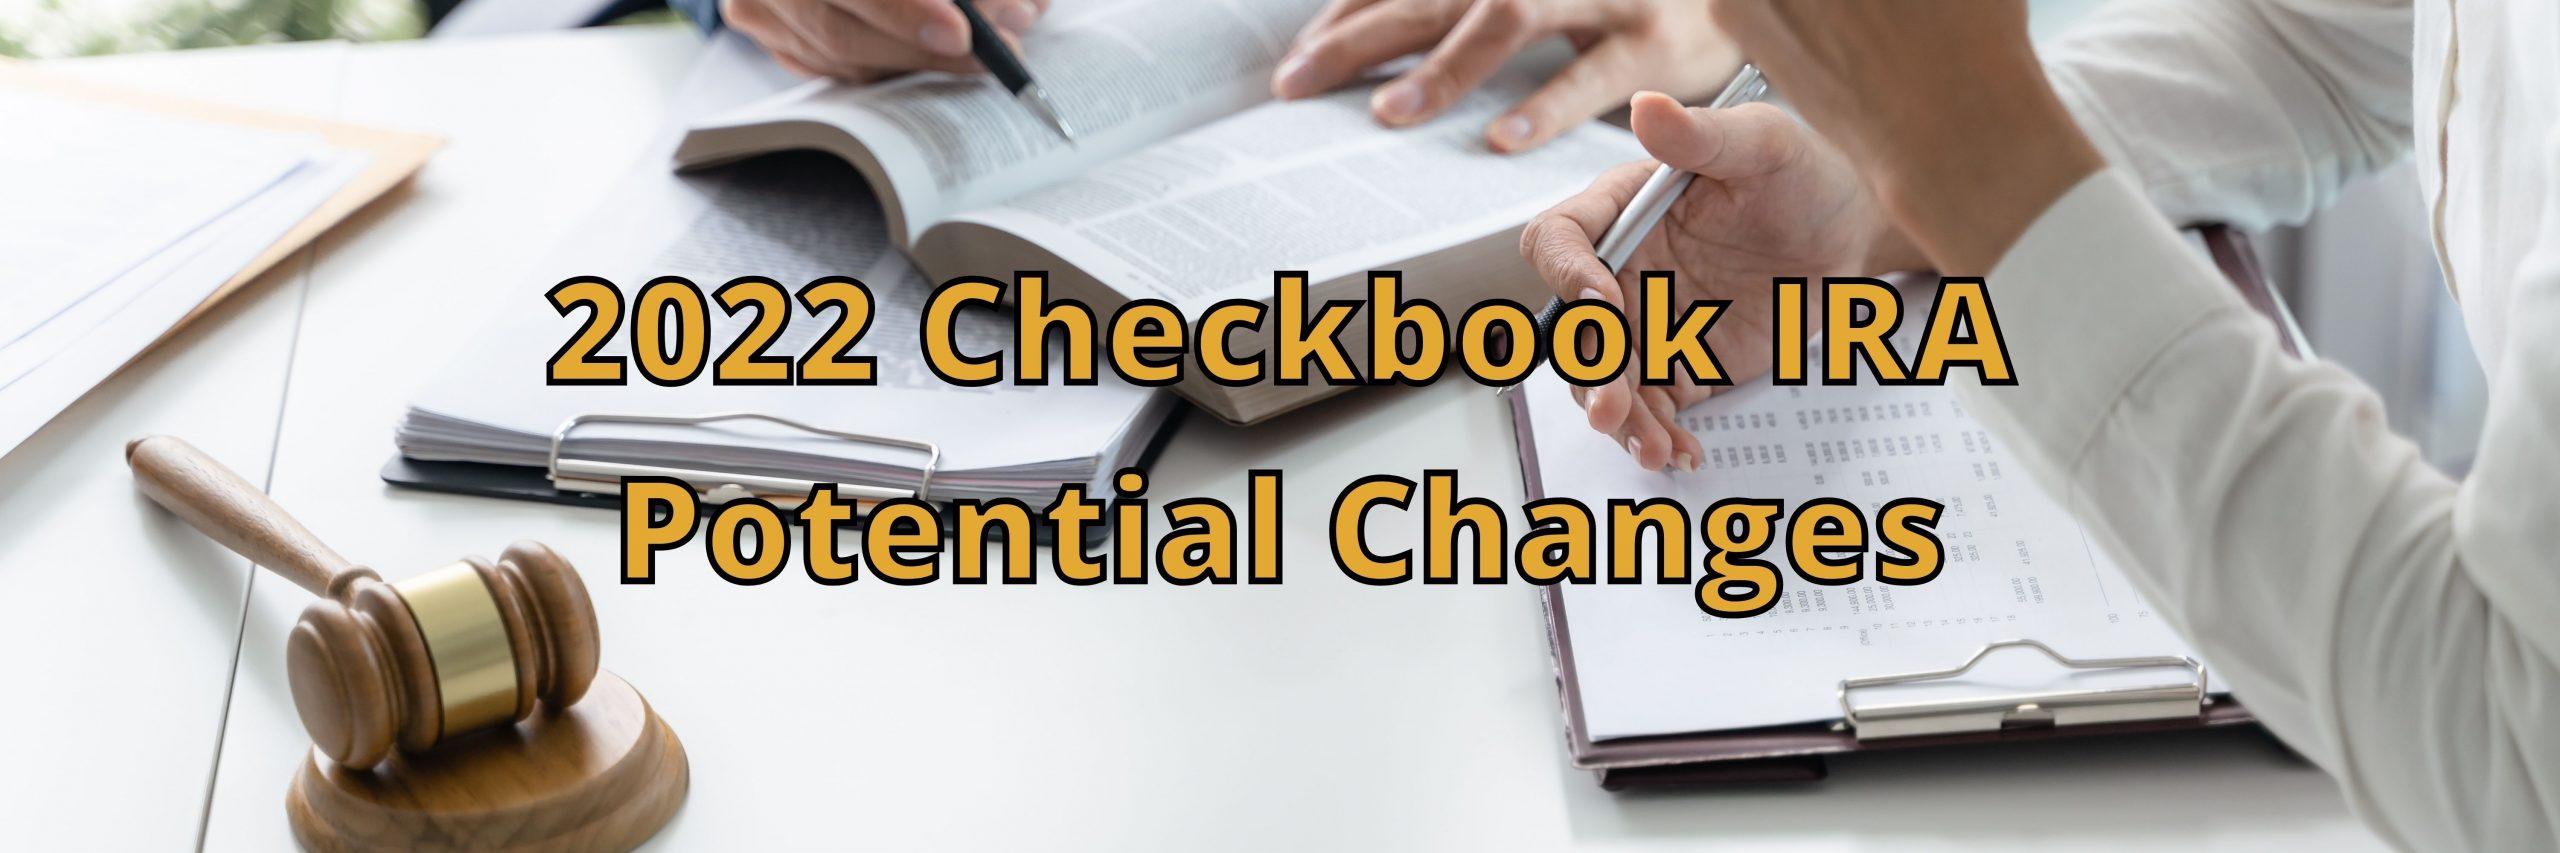 2022 Checkbook IRA Potential Changes Hero Image